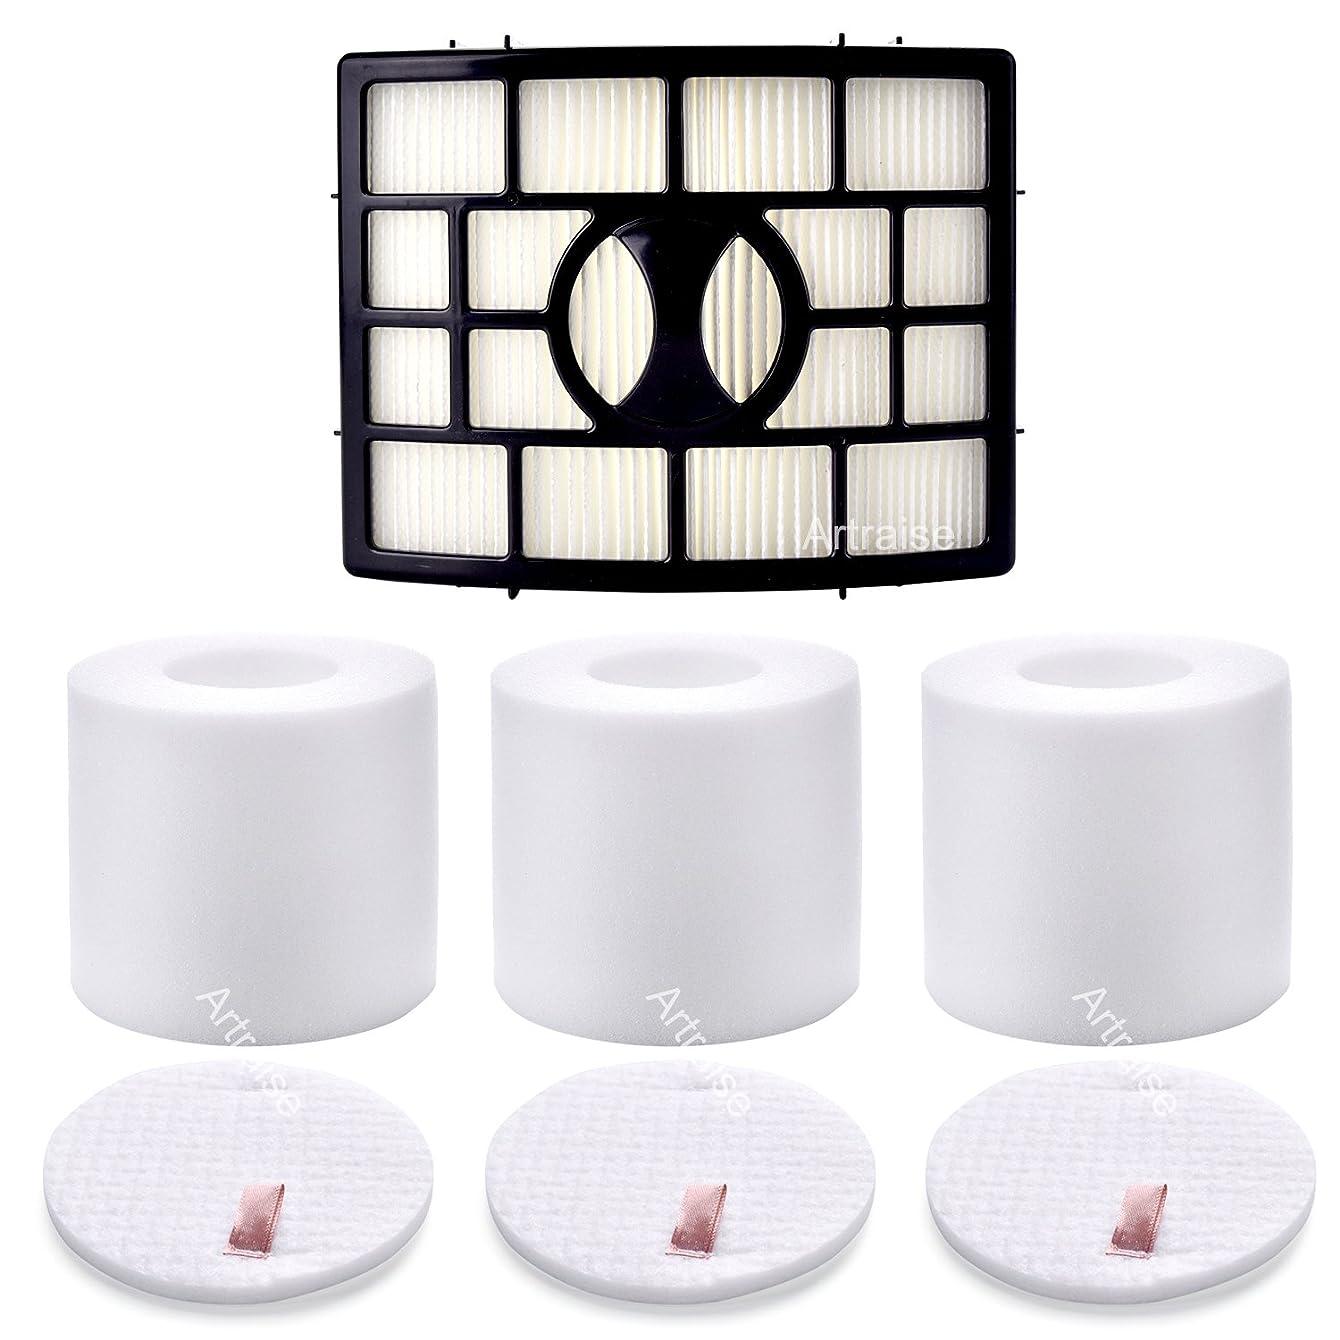 3 Pack Filters for Shark Rotator Powered Lift-Away NV650, NV750, AX950, AX951, AX952, XFF650 & XHF650 By Artraise jwkfxuuqxoyjl49